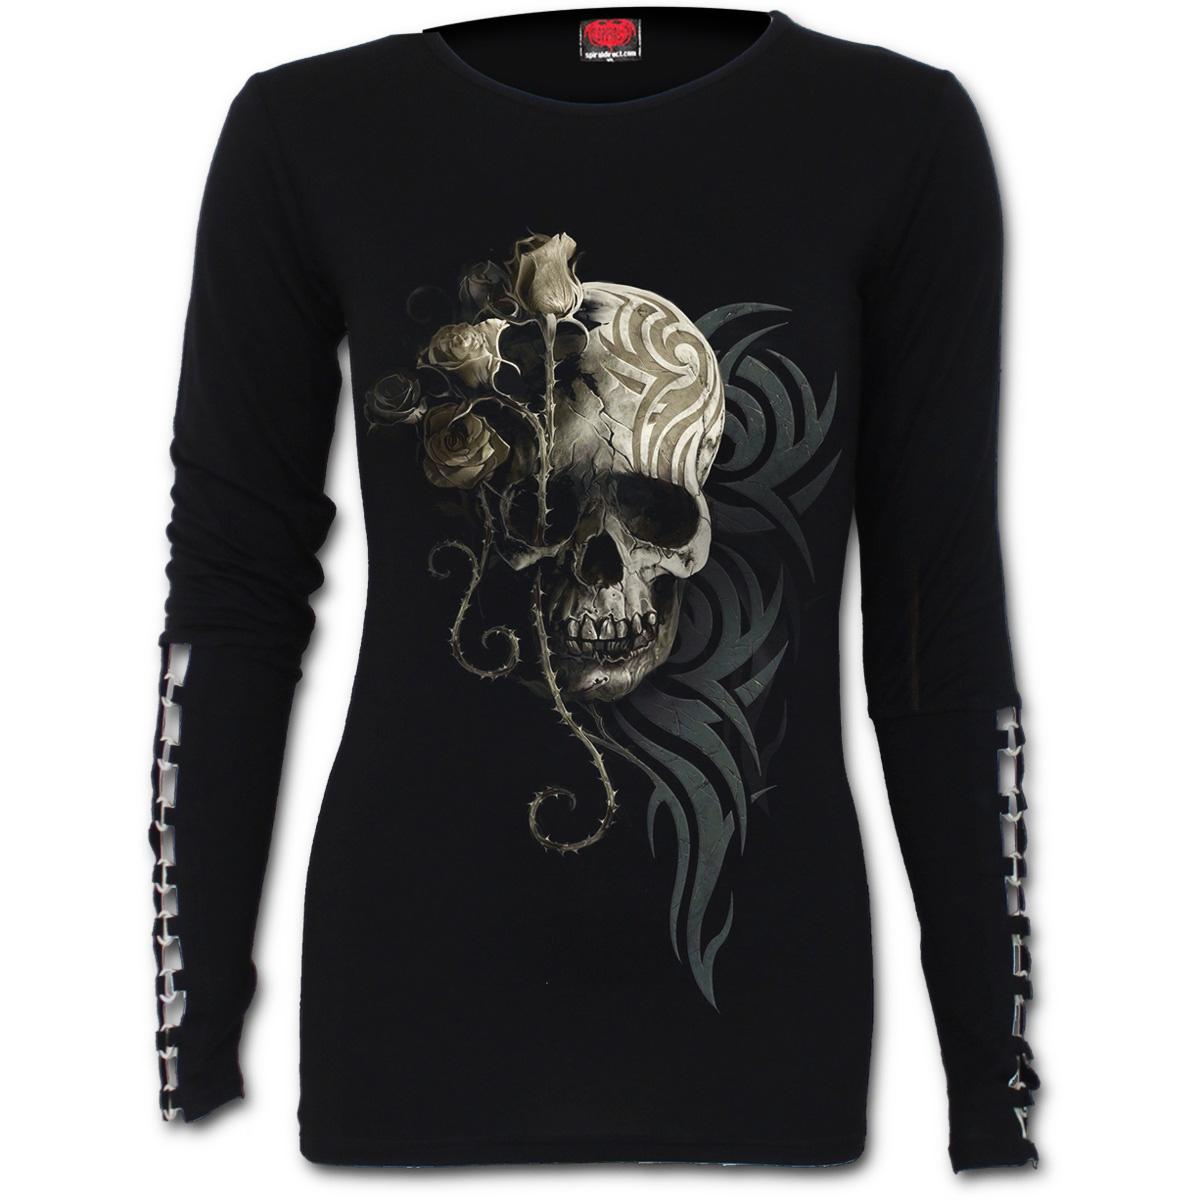 SPIRAL-DIRECT-Ladies-Black-Goth-DARK-ANGEL-Skull-Buckle-L-Sleeve-All-Sizes thumbnail 5